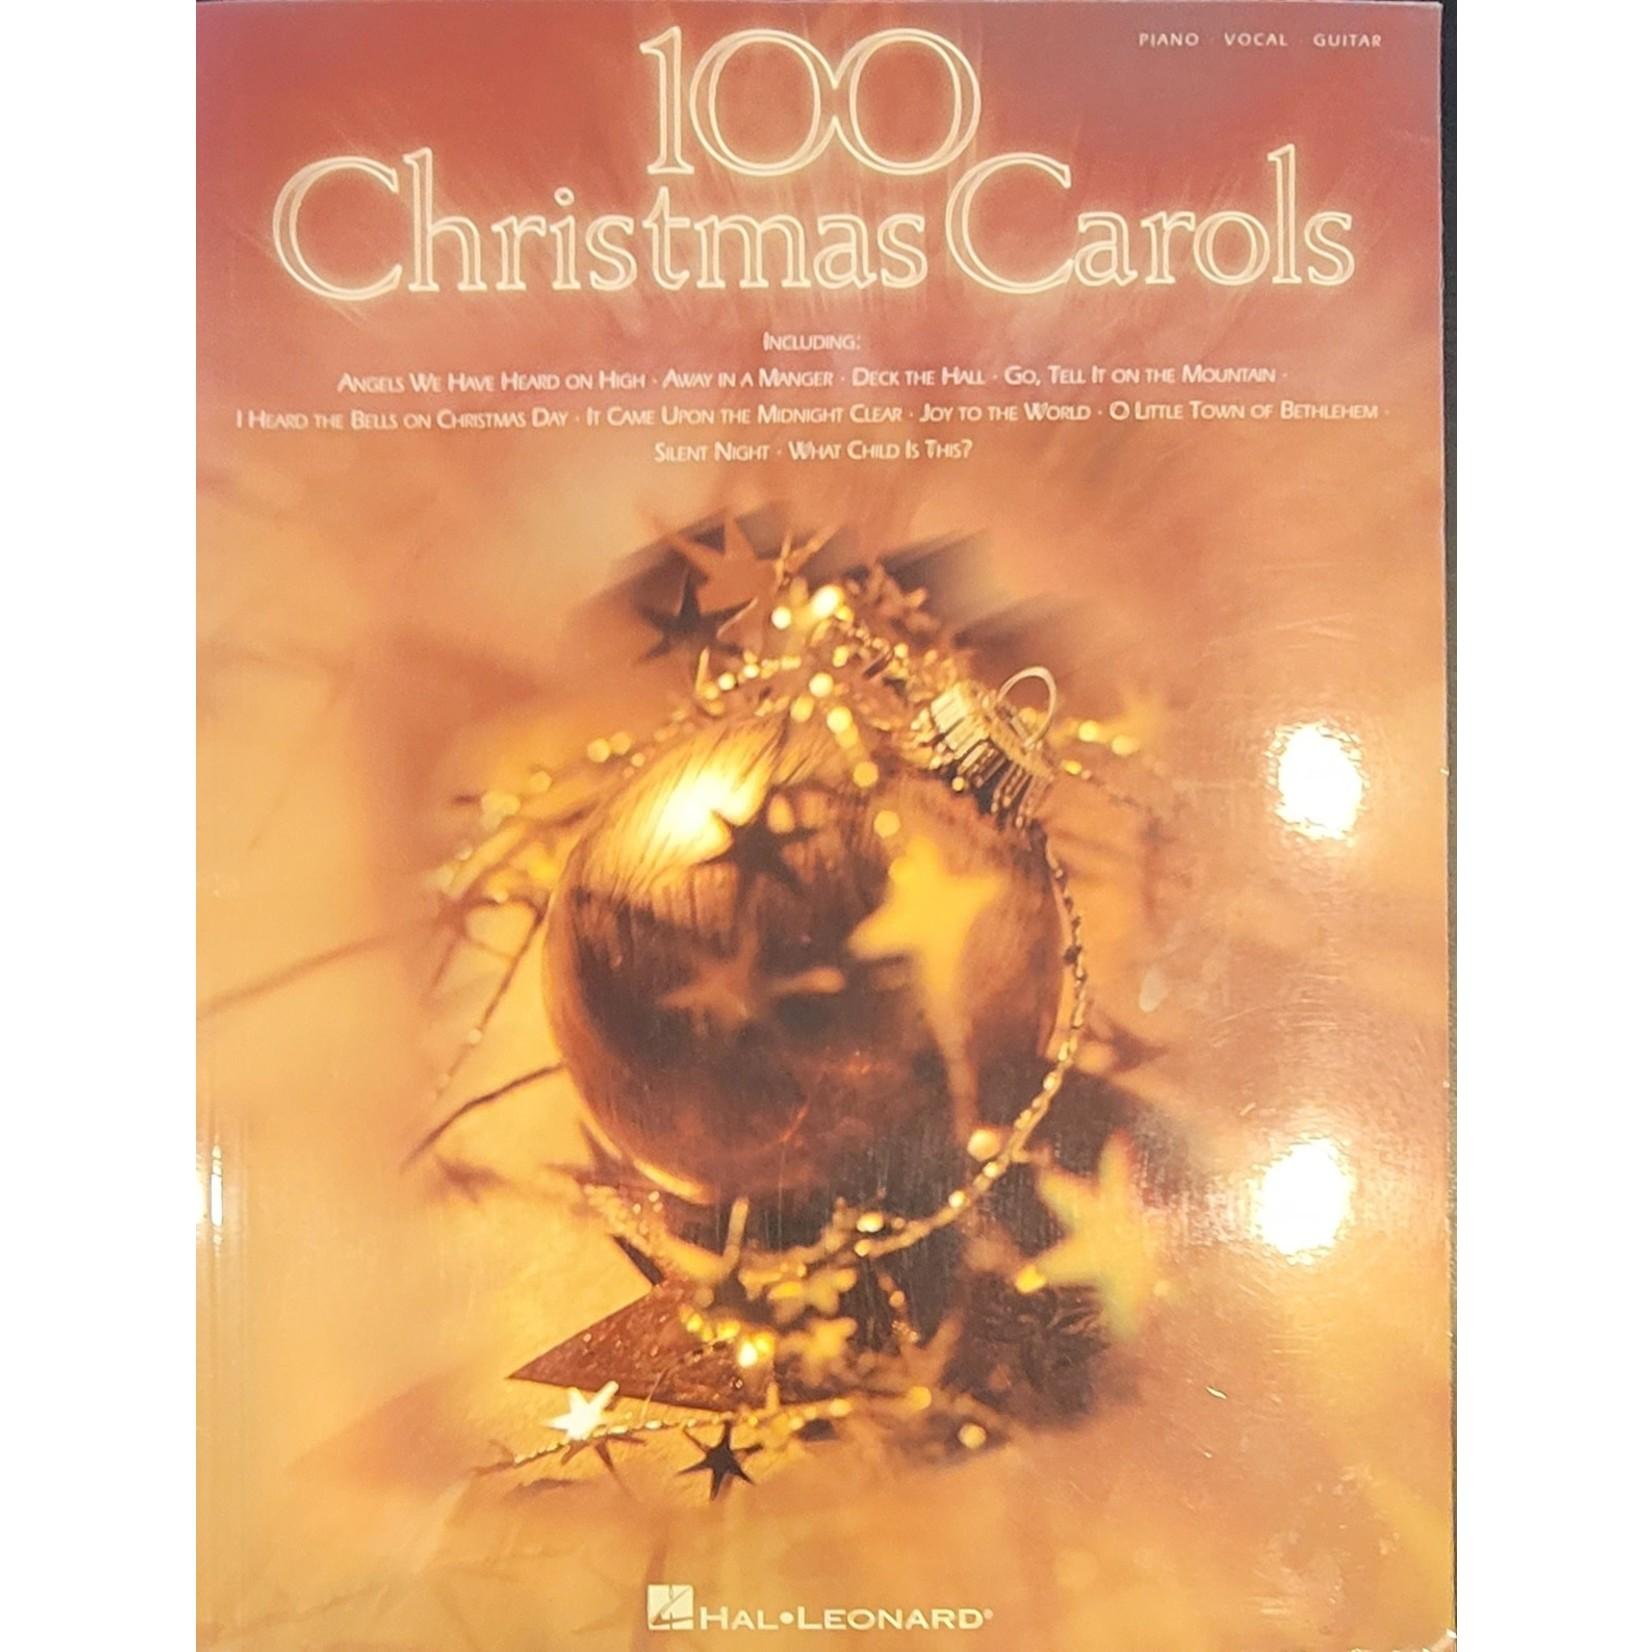 HAL LEONARD LIVRE 100 CHRISTMAS CAROLS